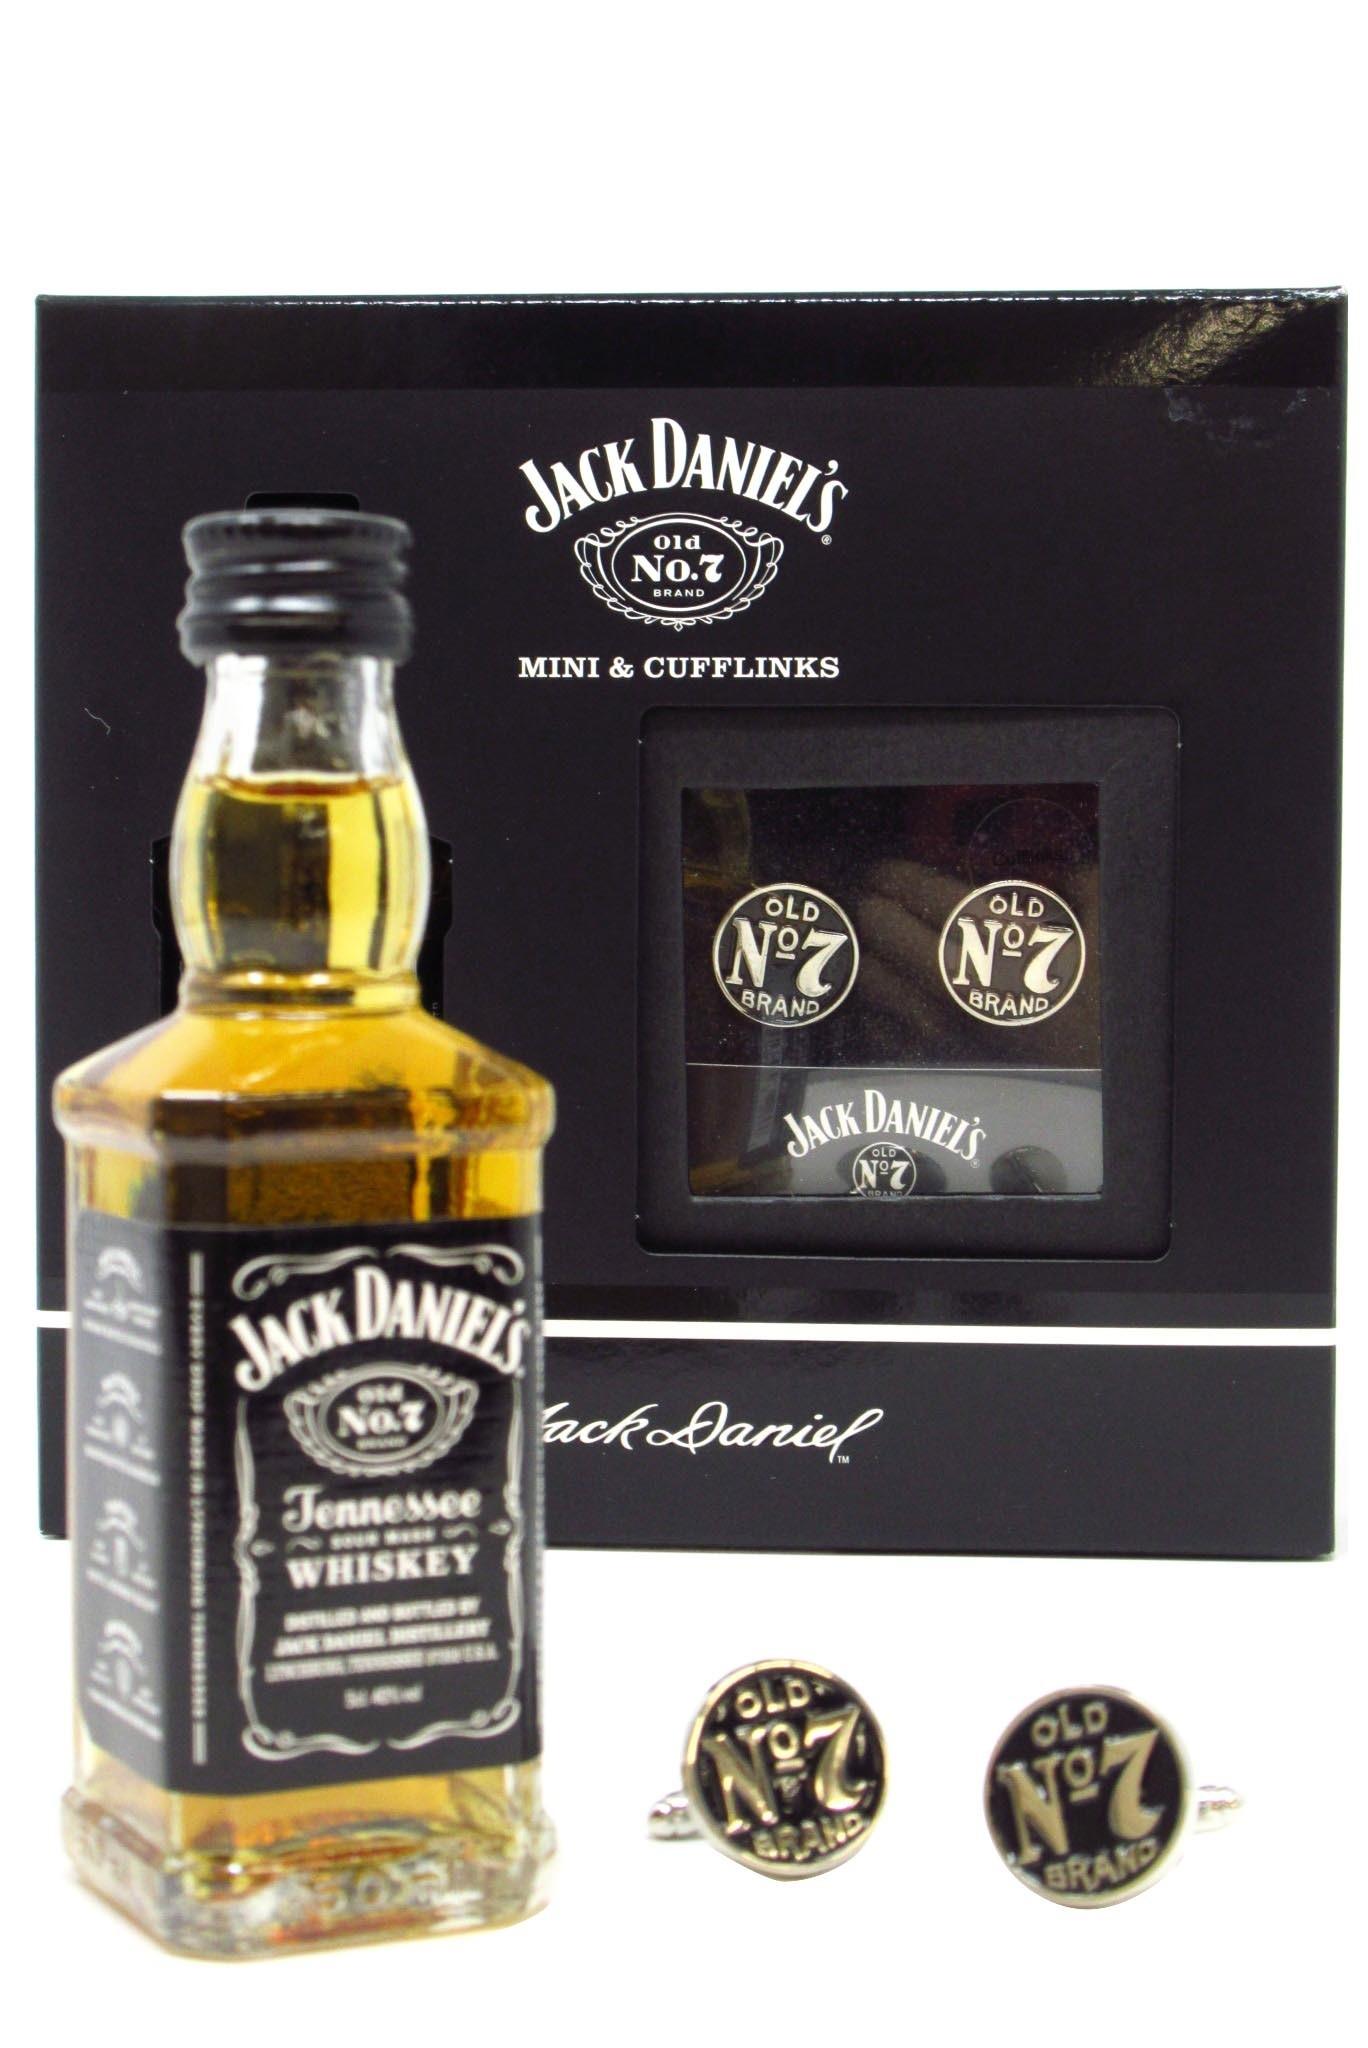 Jack Daniels miniature and cufflinks £1.50 @ Tesco (Danestone)